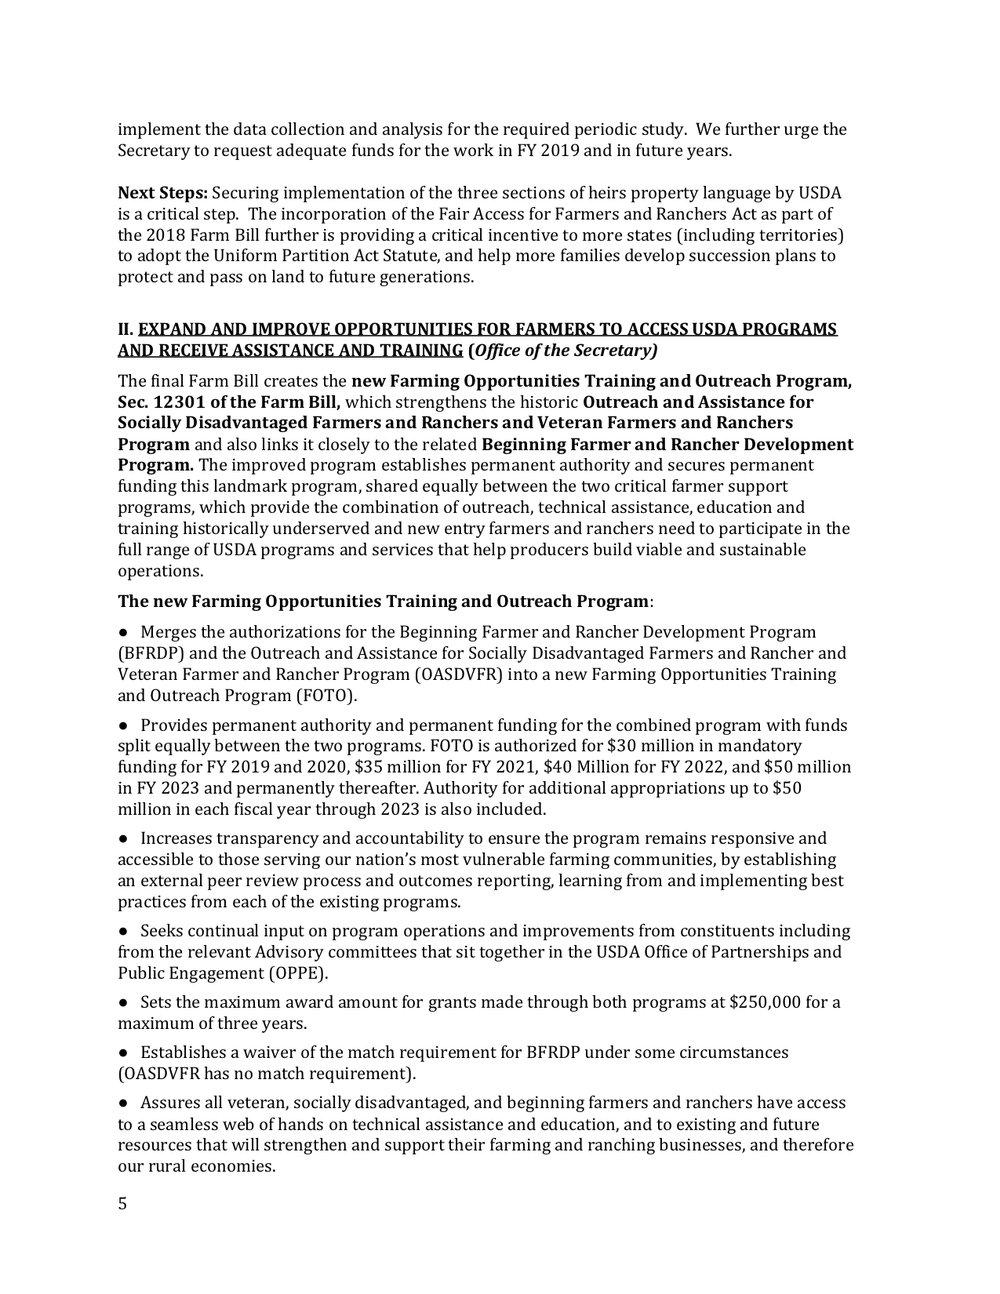 2018 Farm Bill Implementation Recommendations - Rural Co etal final March 1 page 6.jpg